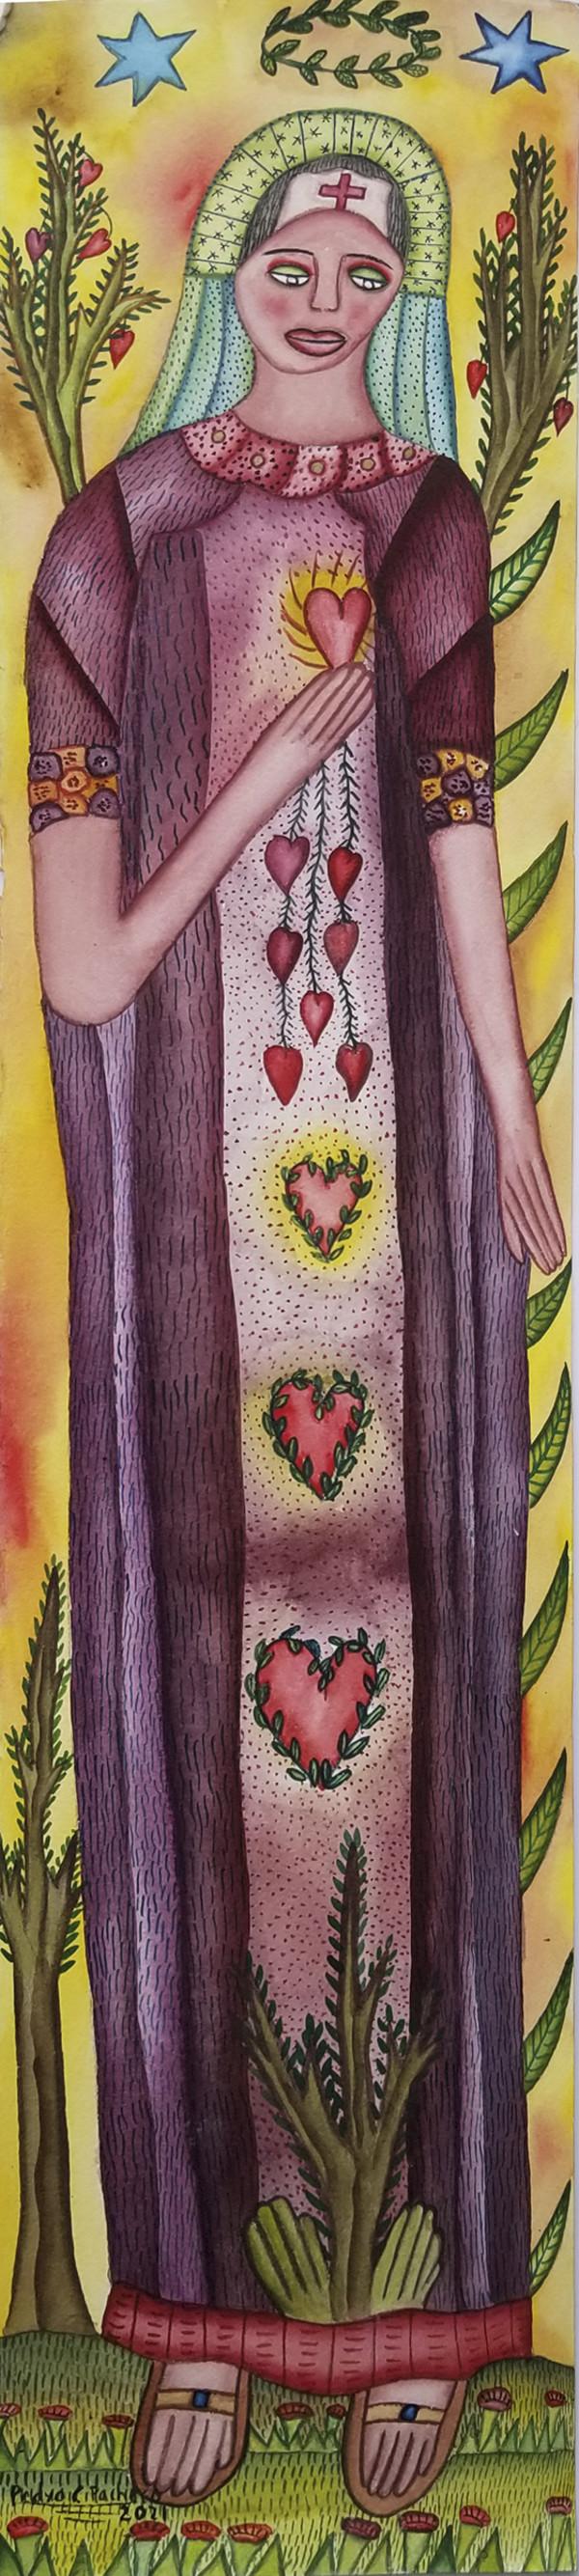 Mujer de Esperanza / Woman of Hope by Pedro Cruz Pacheco